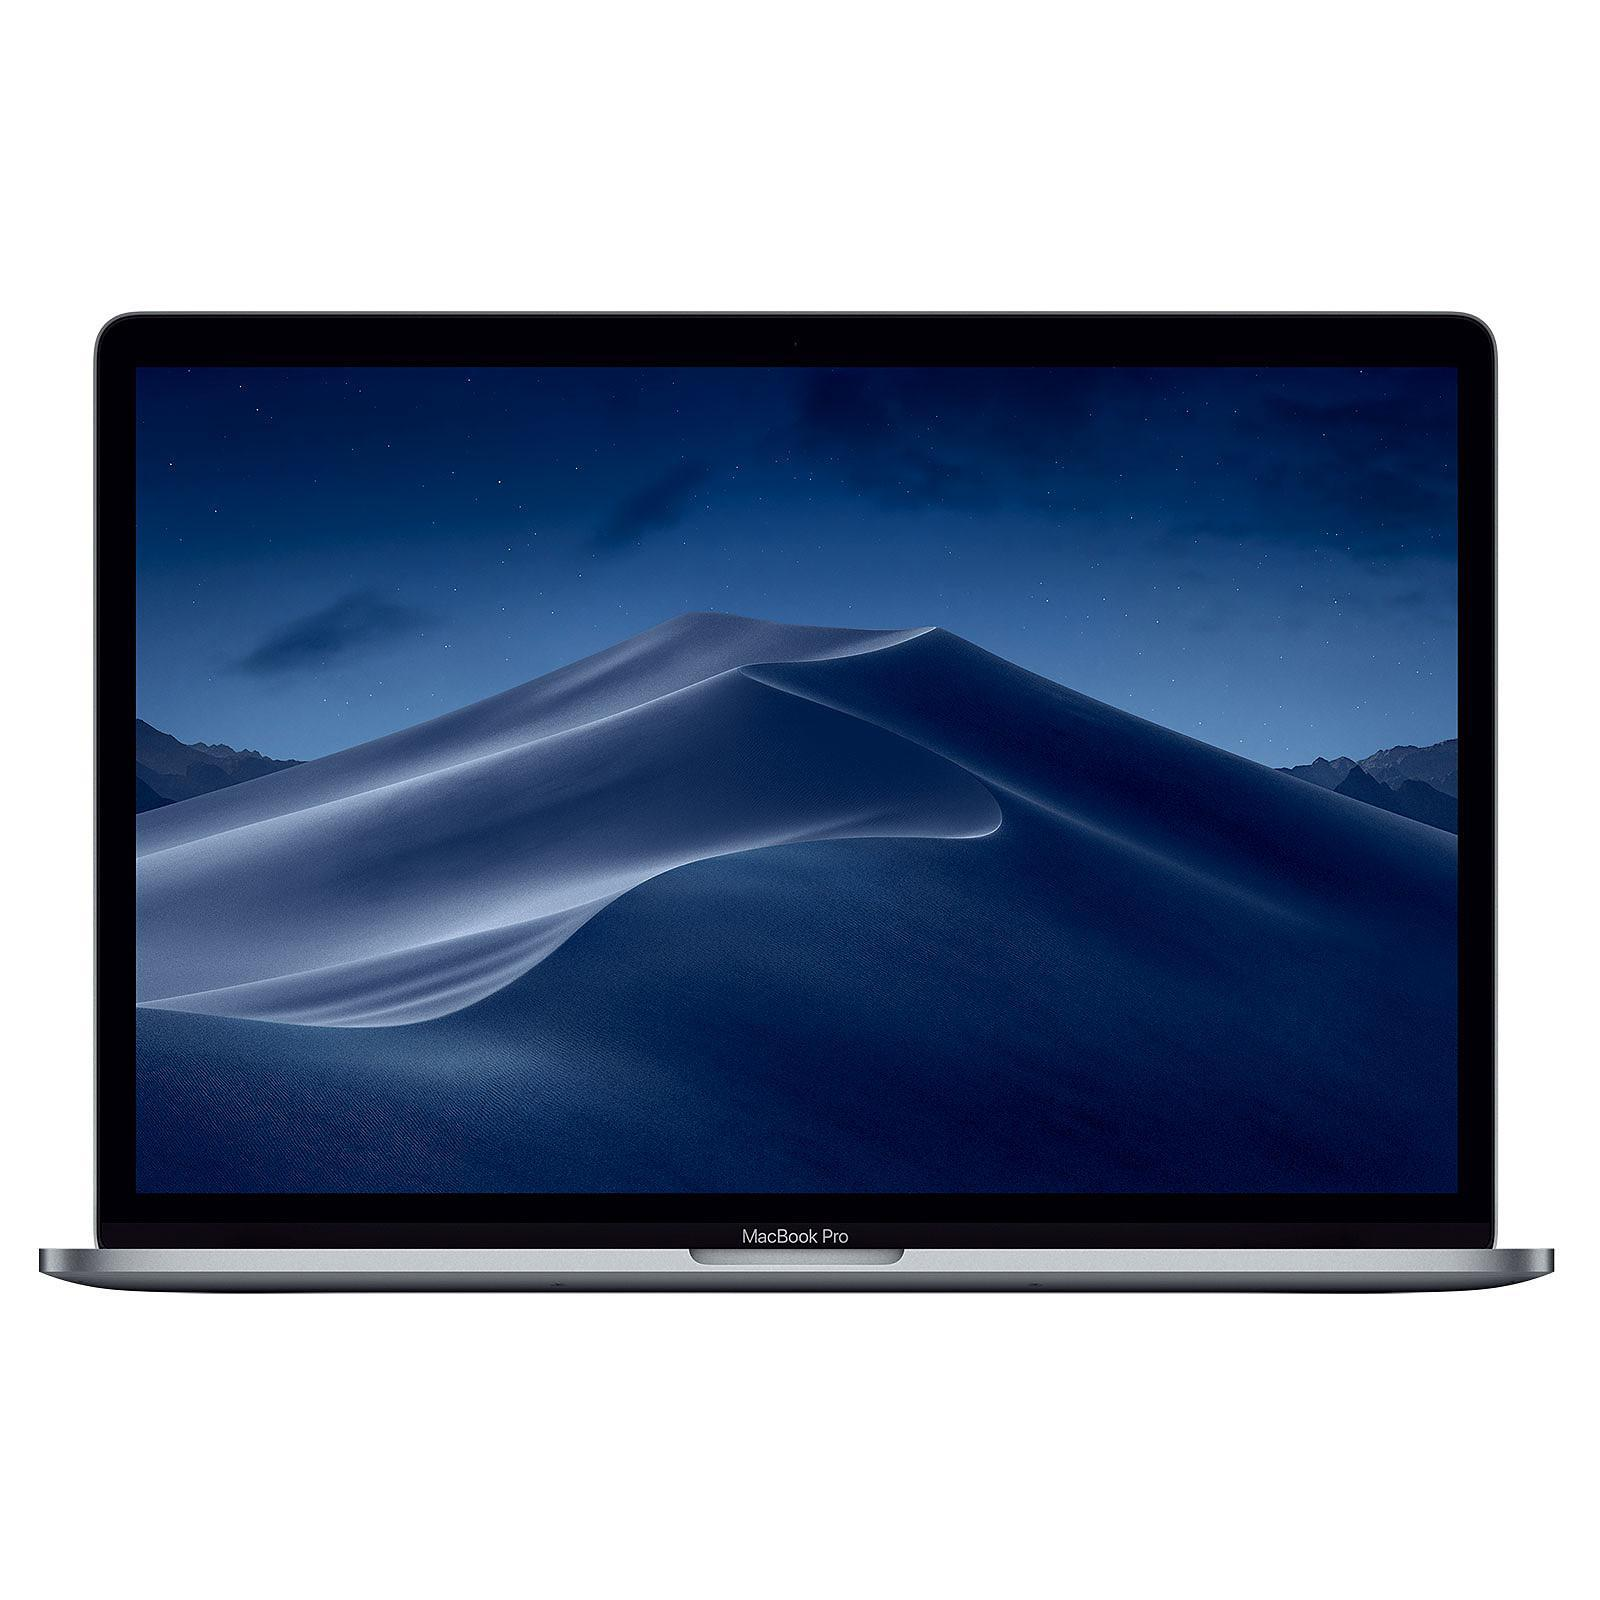 MacBook Pro Retina 15,4-tum (2019) - Core i7 - 16GB - SSD 256 GB AZERTY - Fransk